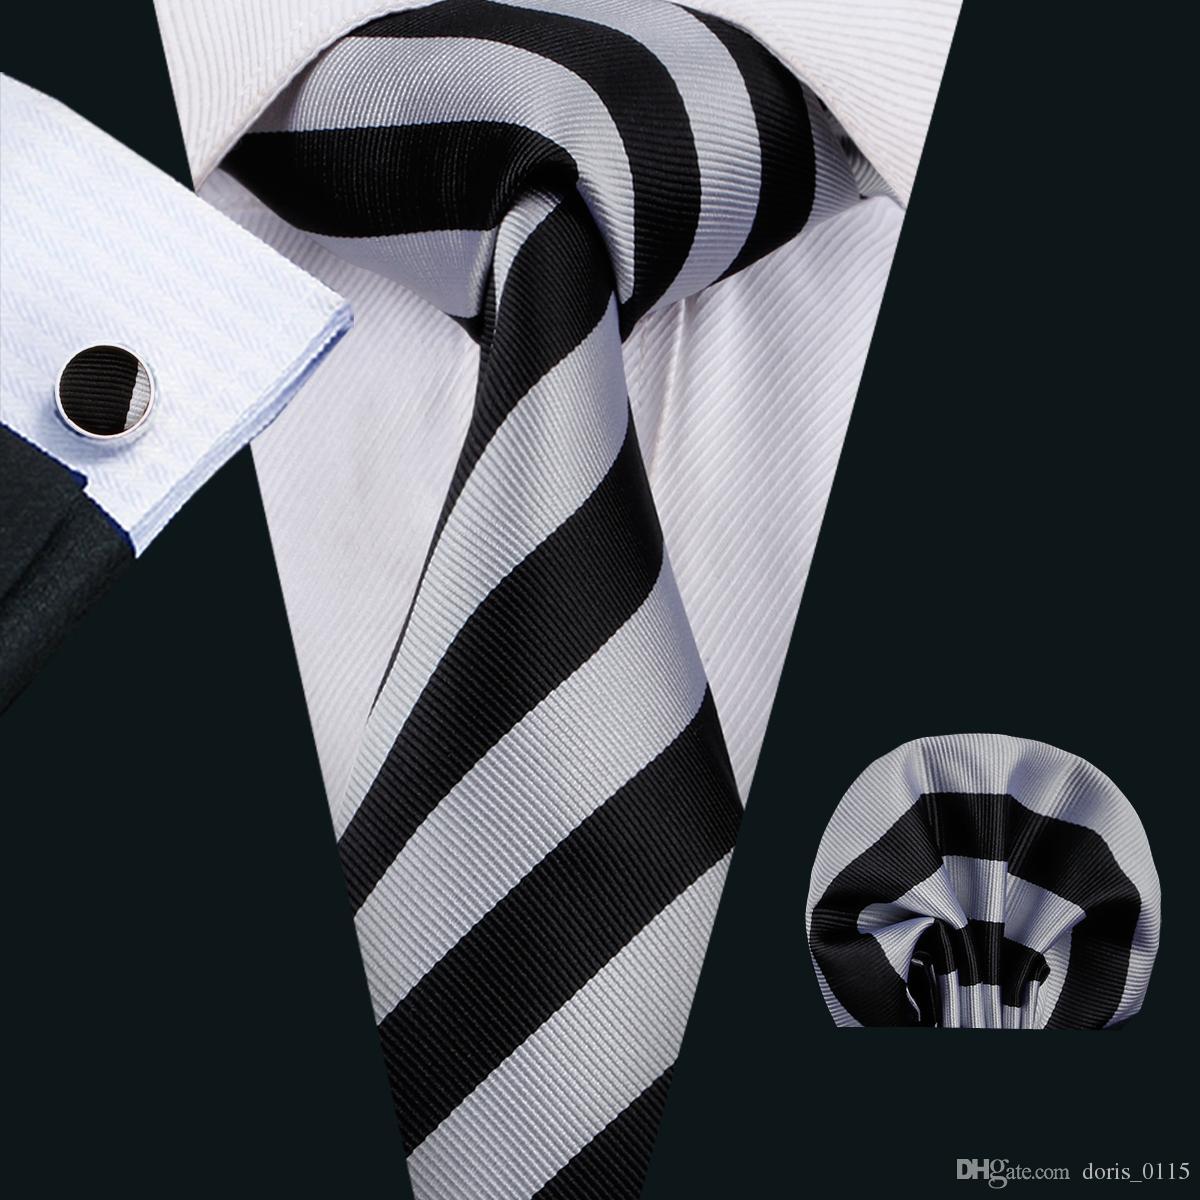 Classic Silk Ties for Men Setips Tie Sets White&Black Mens Necties Tie Hanky Cufflinks Jacquard Woven Meeting Business Wedding Party N-1501